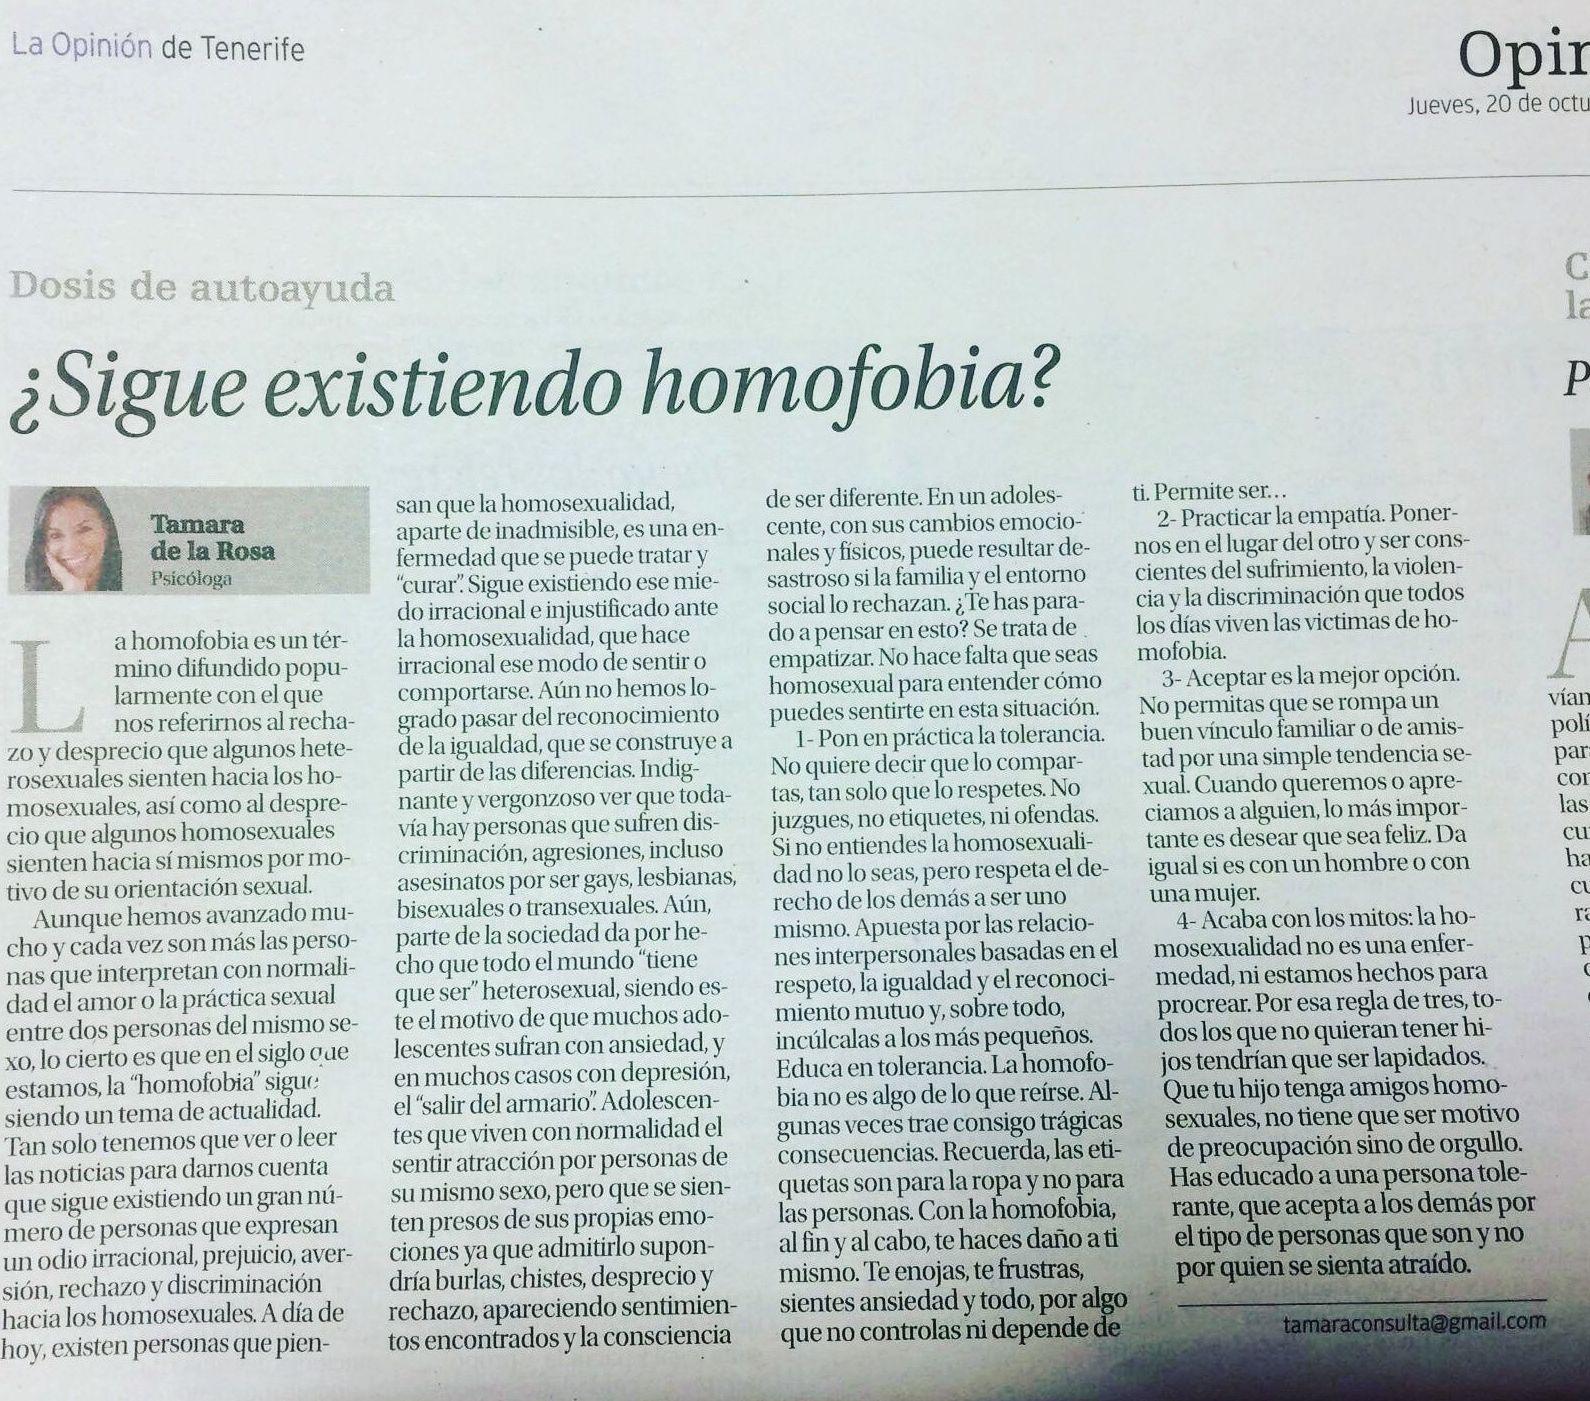 ¿SIGUE EXISTIENDO HOMOFOBIA?